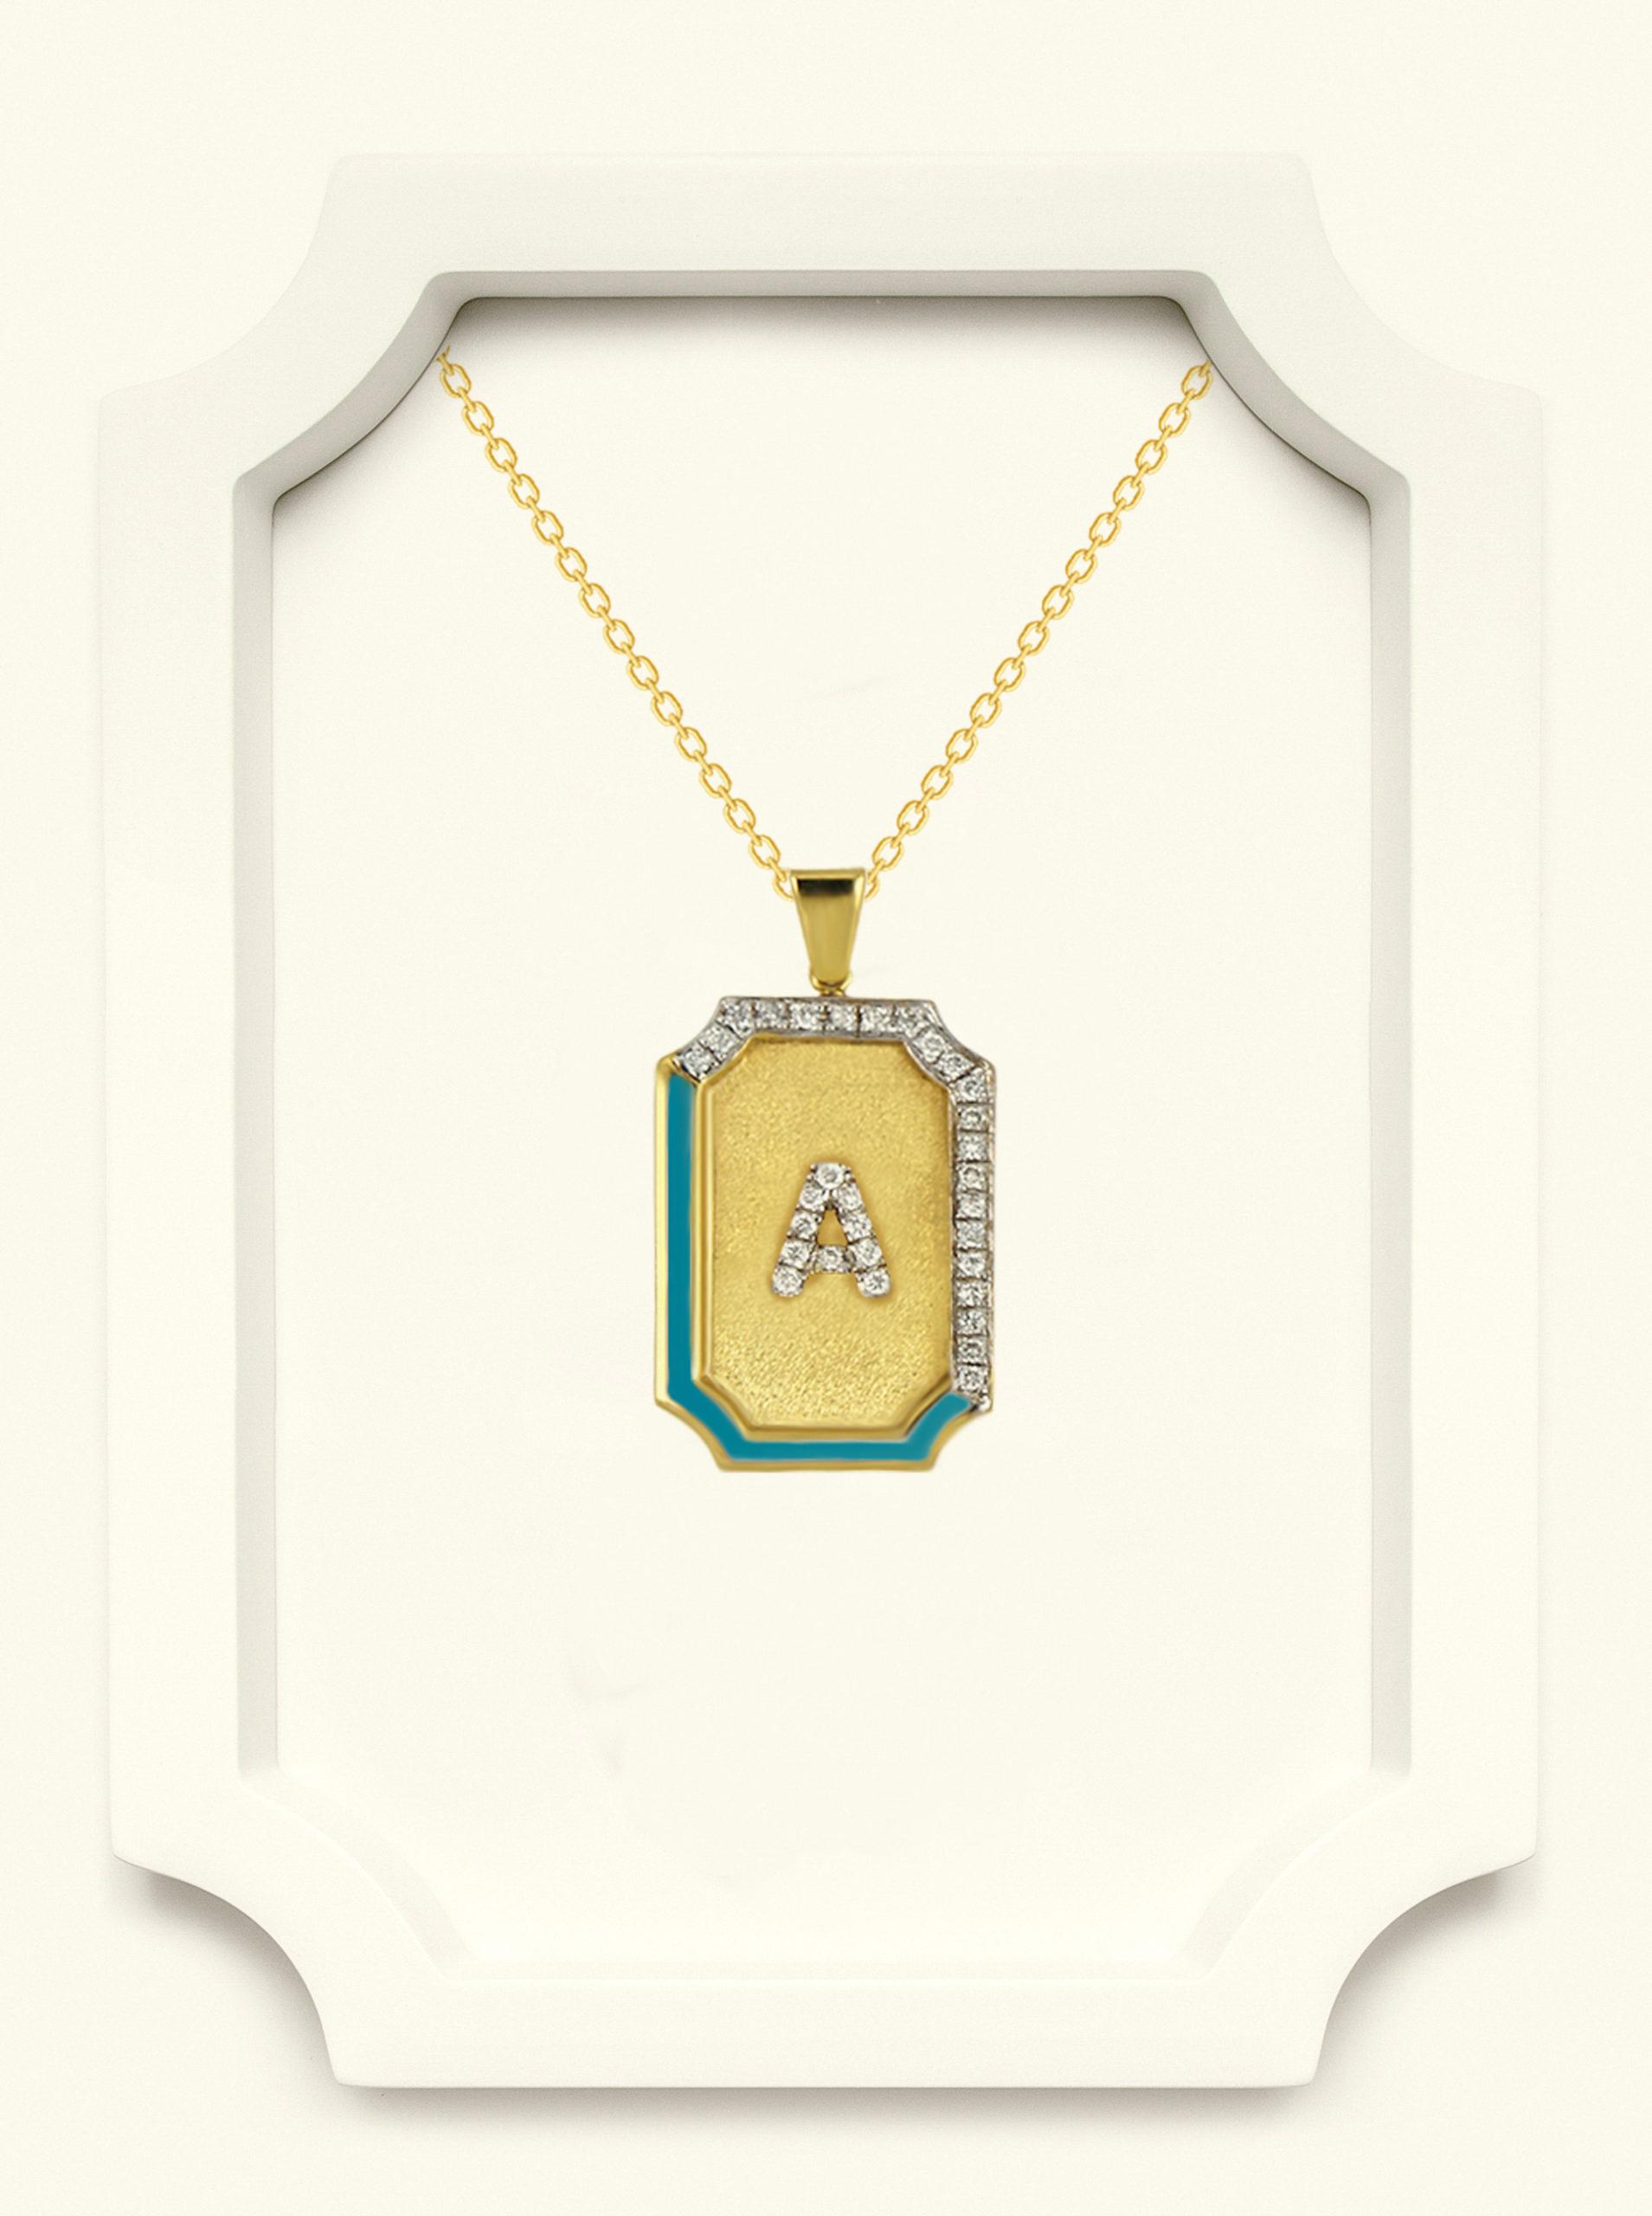 Saba Yellow Gold Signature Pendant With Blue Enamel